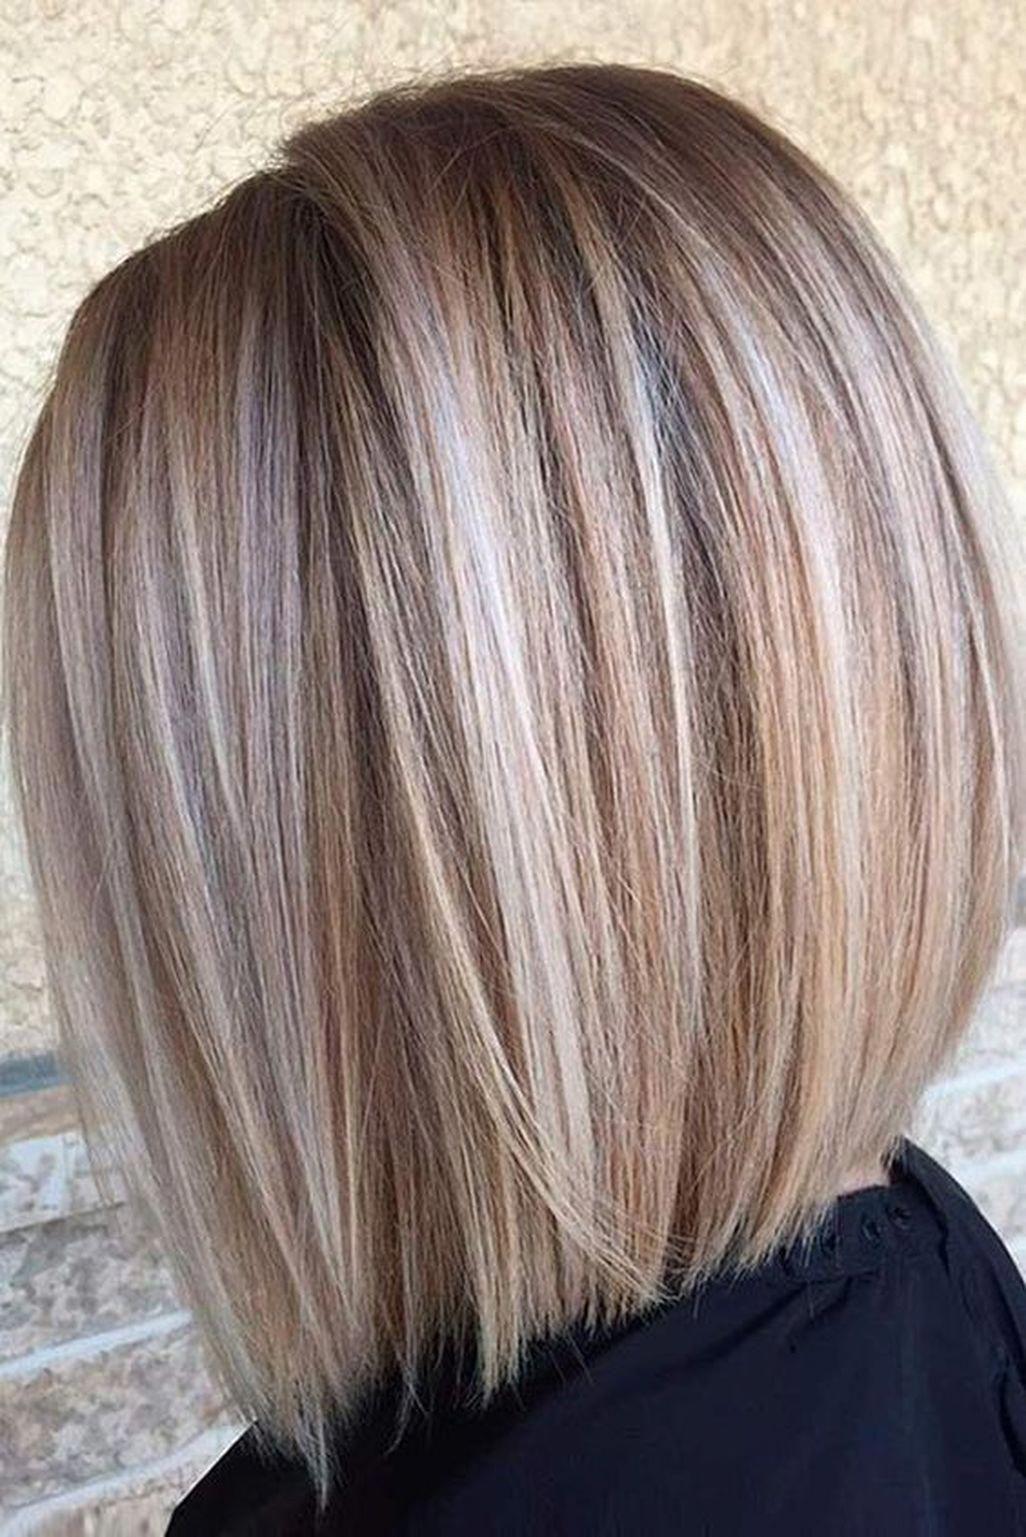 Pin by Full Head of Hair on Hair Loss  Pinterest  Hair Hair